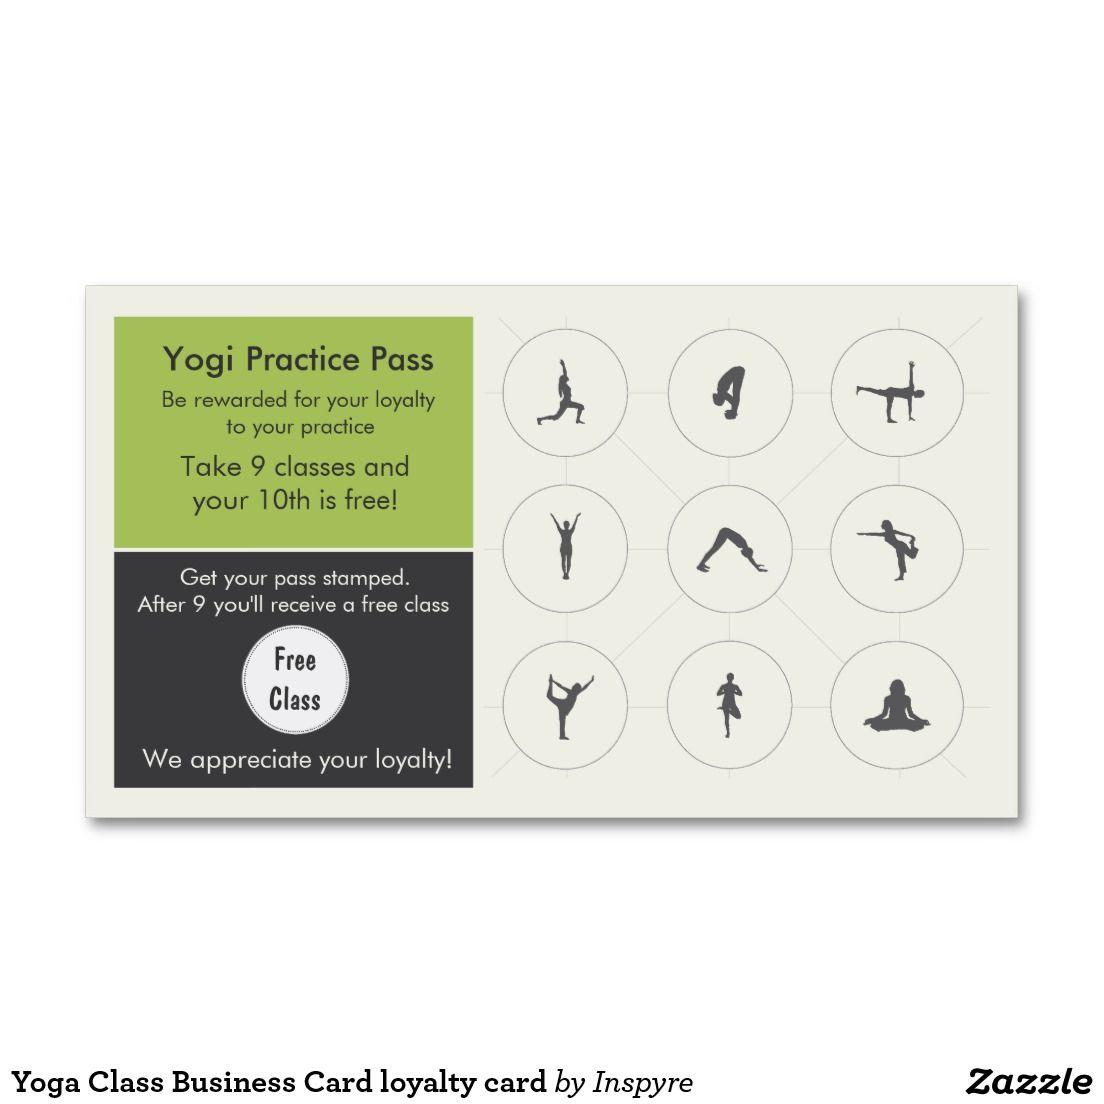 Yoga Class Business Card loyalty card | Yoga studio | Pinterest ...